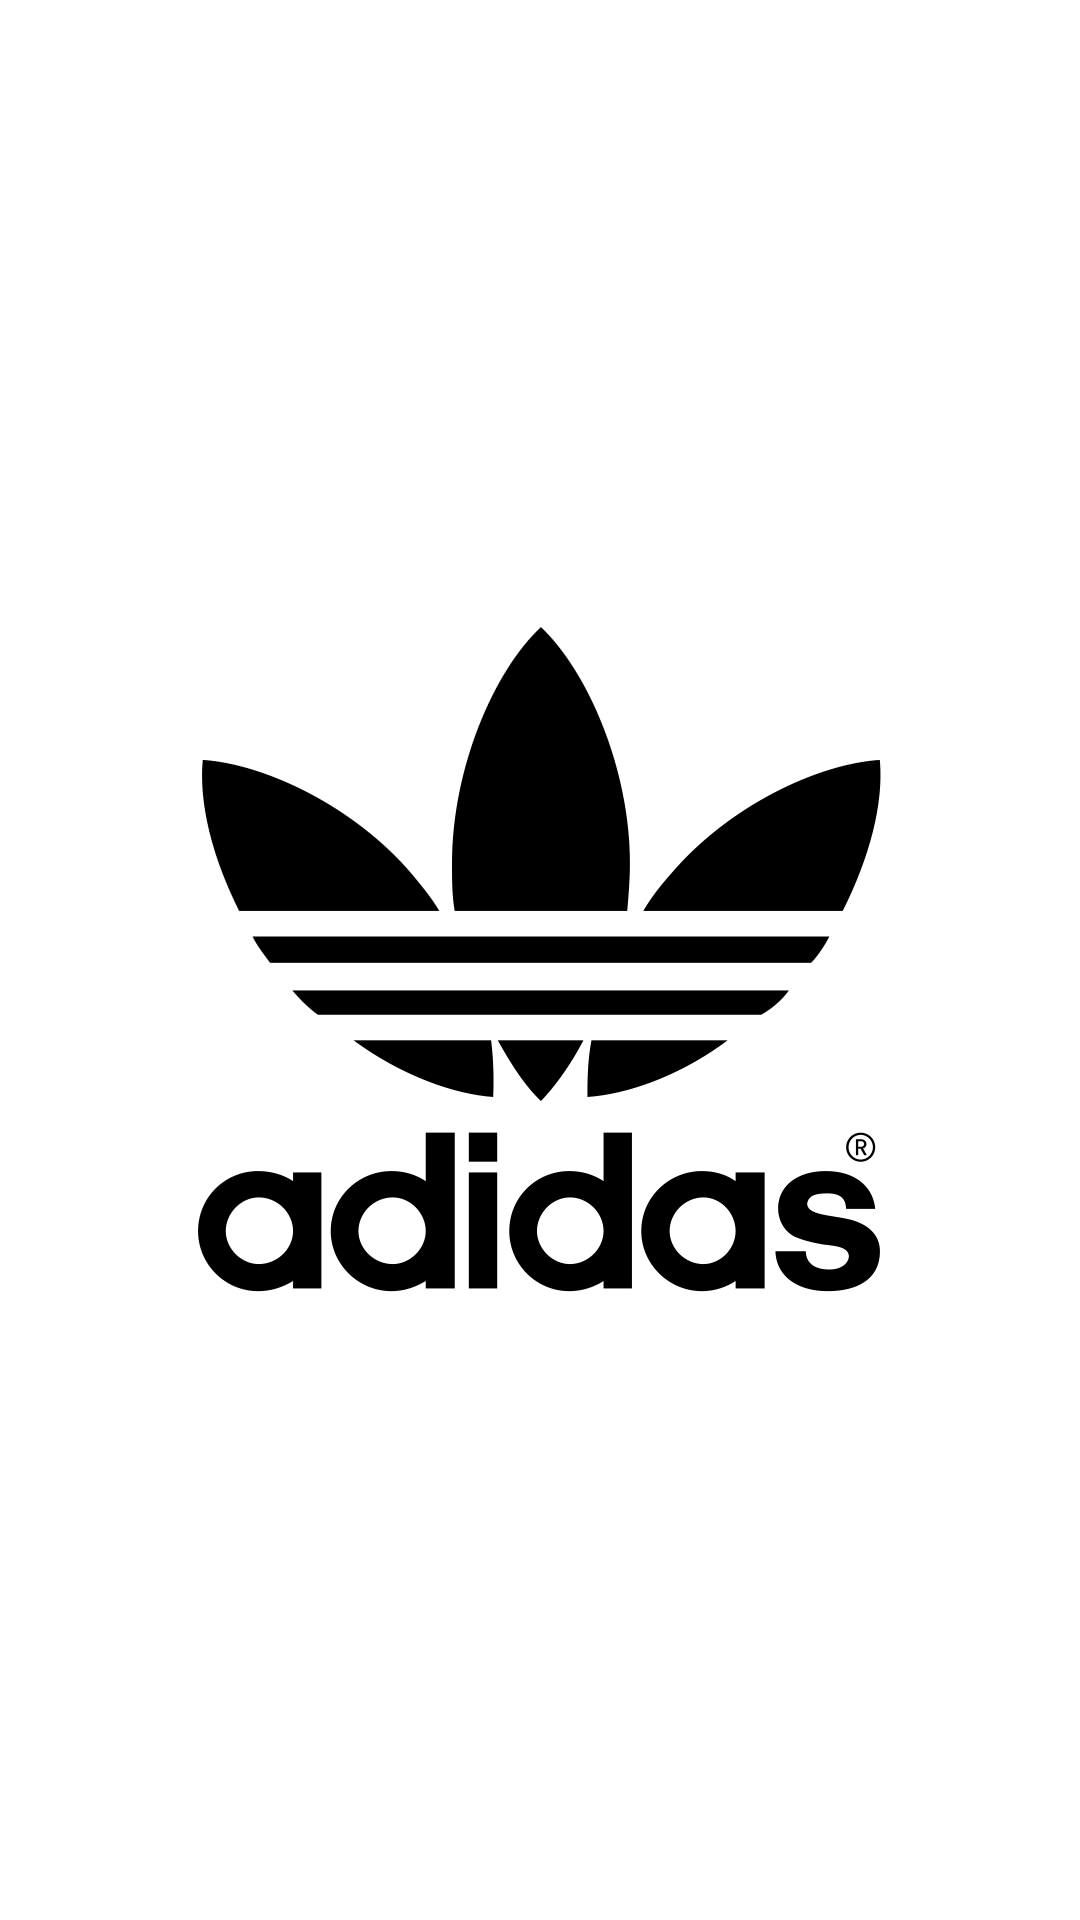 adidas01 | Adidas | Pinterest